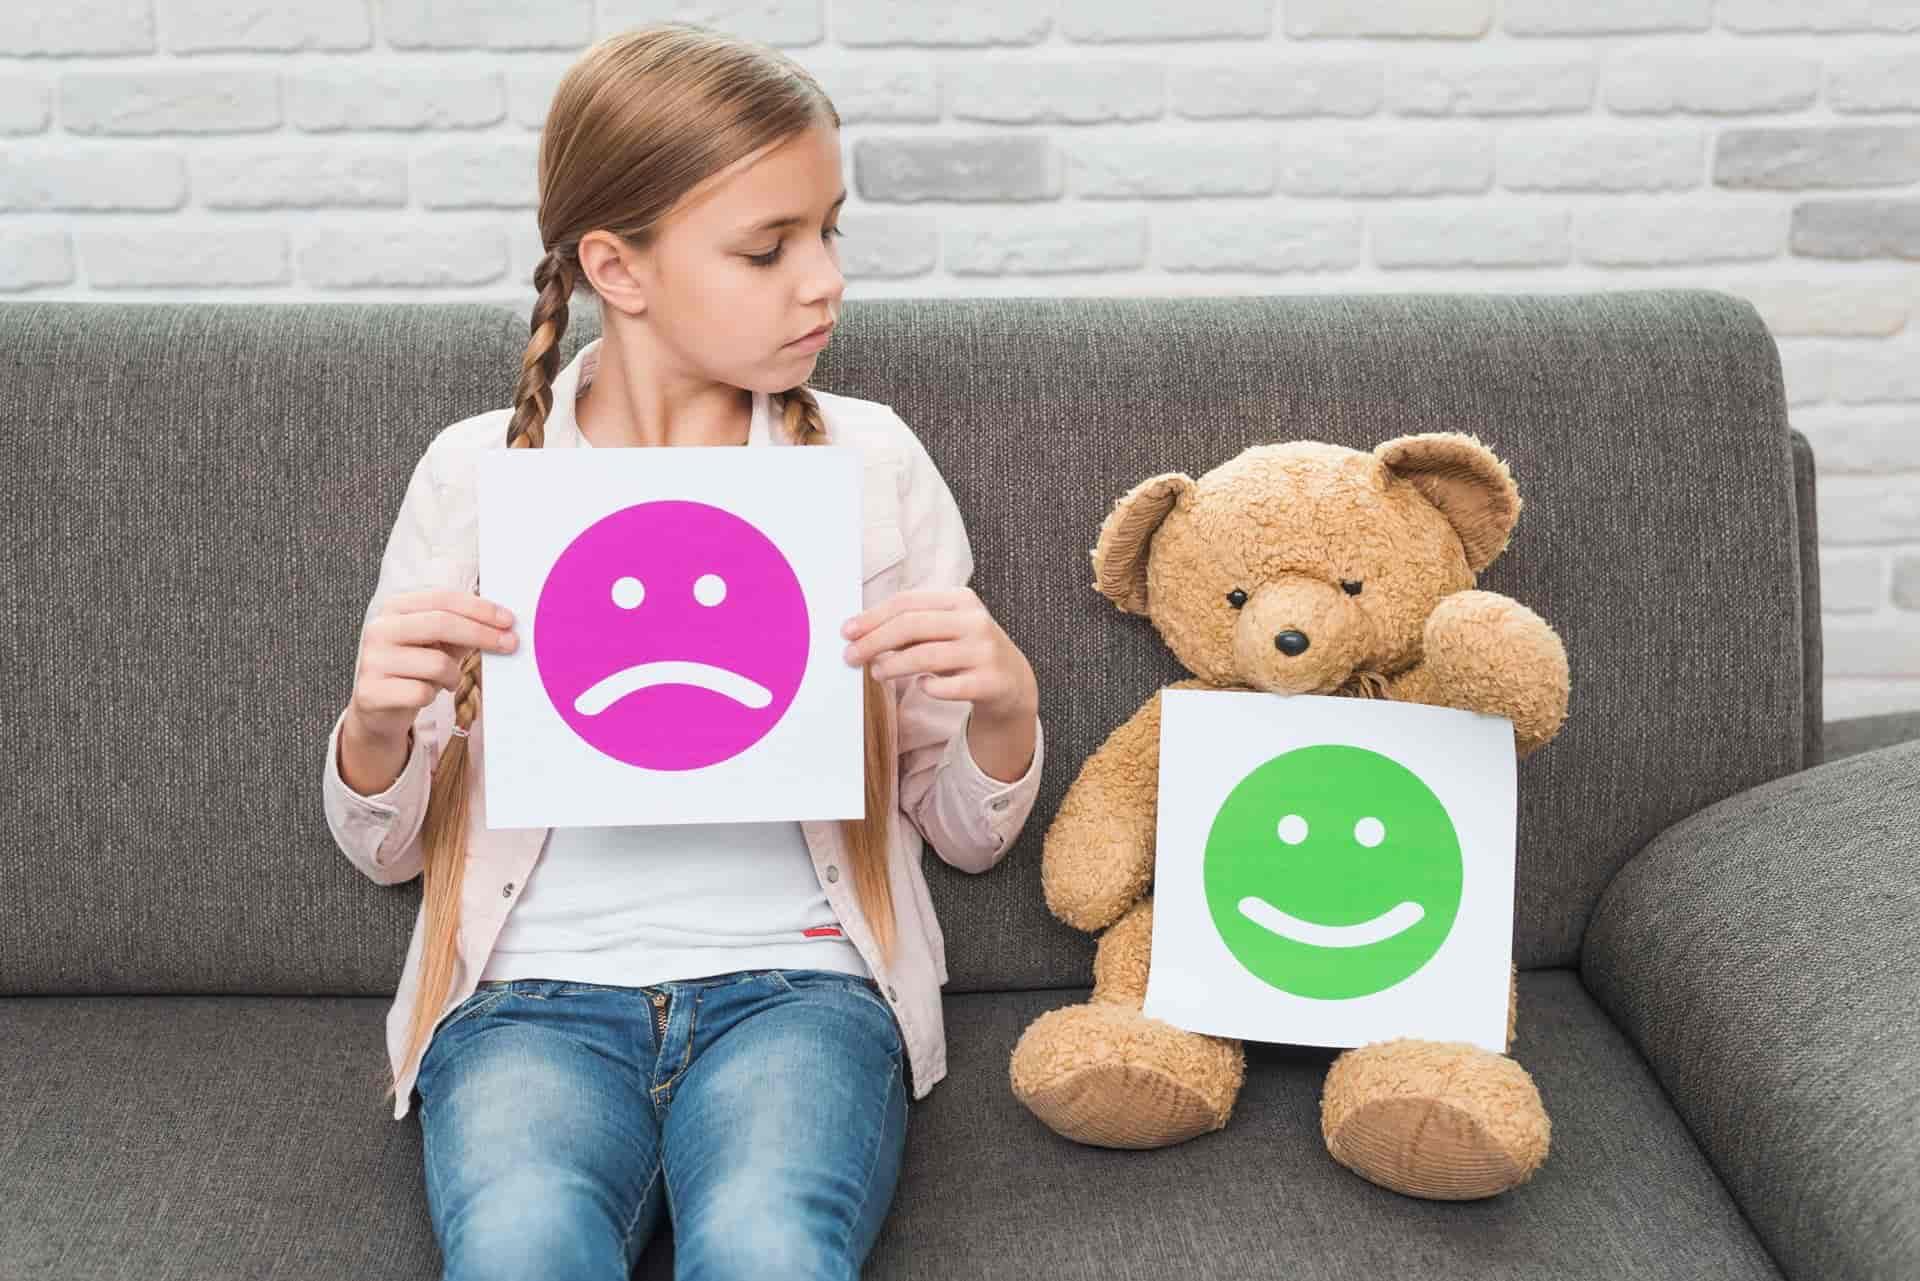 bursa cocuk psikiyatri 4 1 | Anasayfa 5